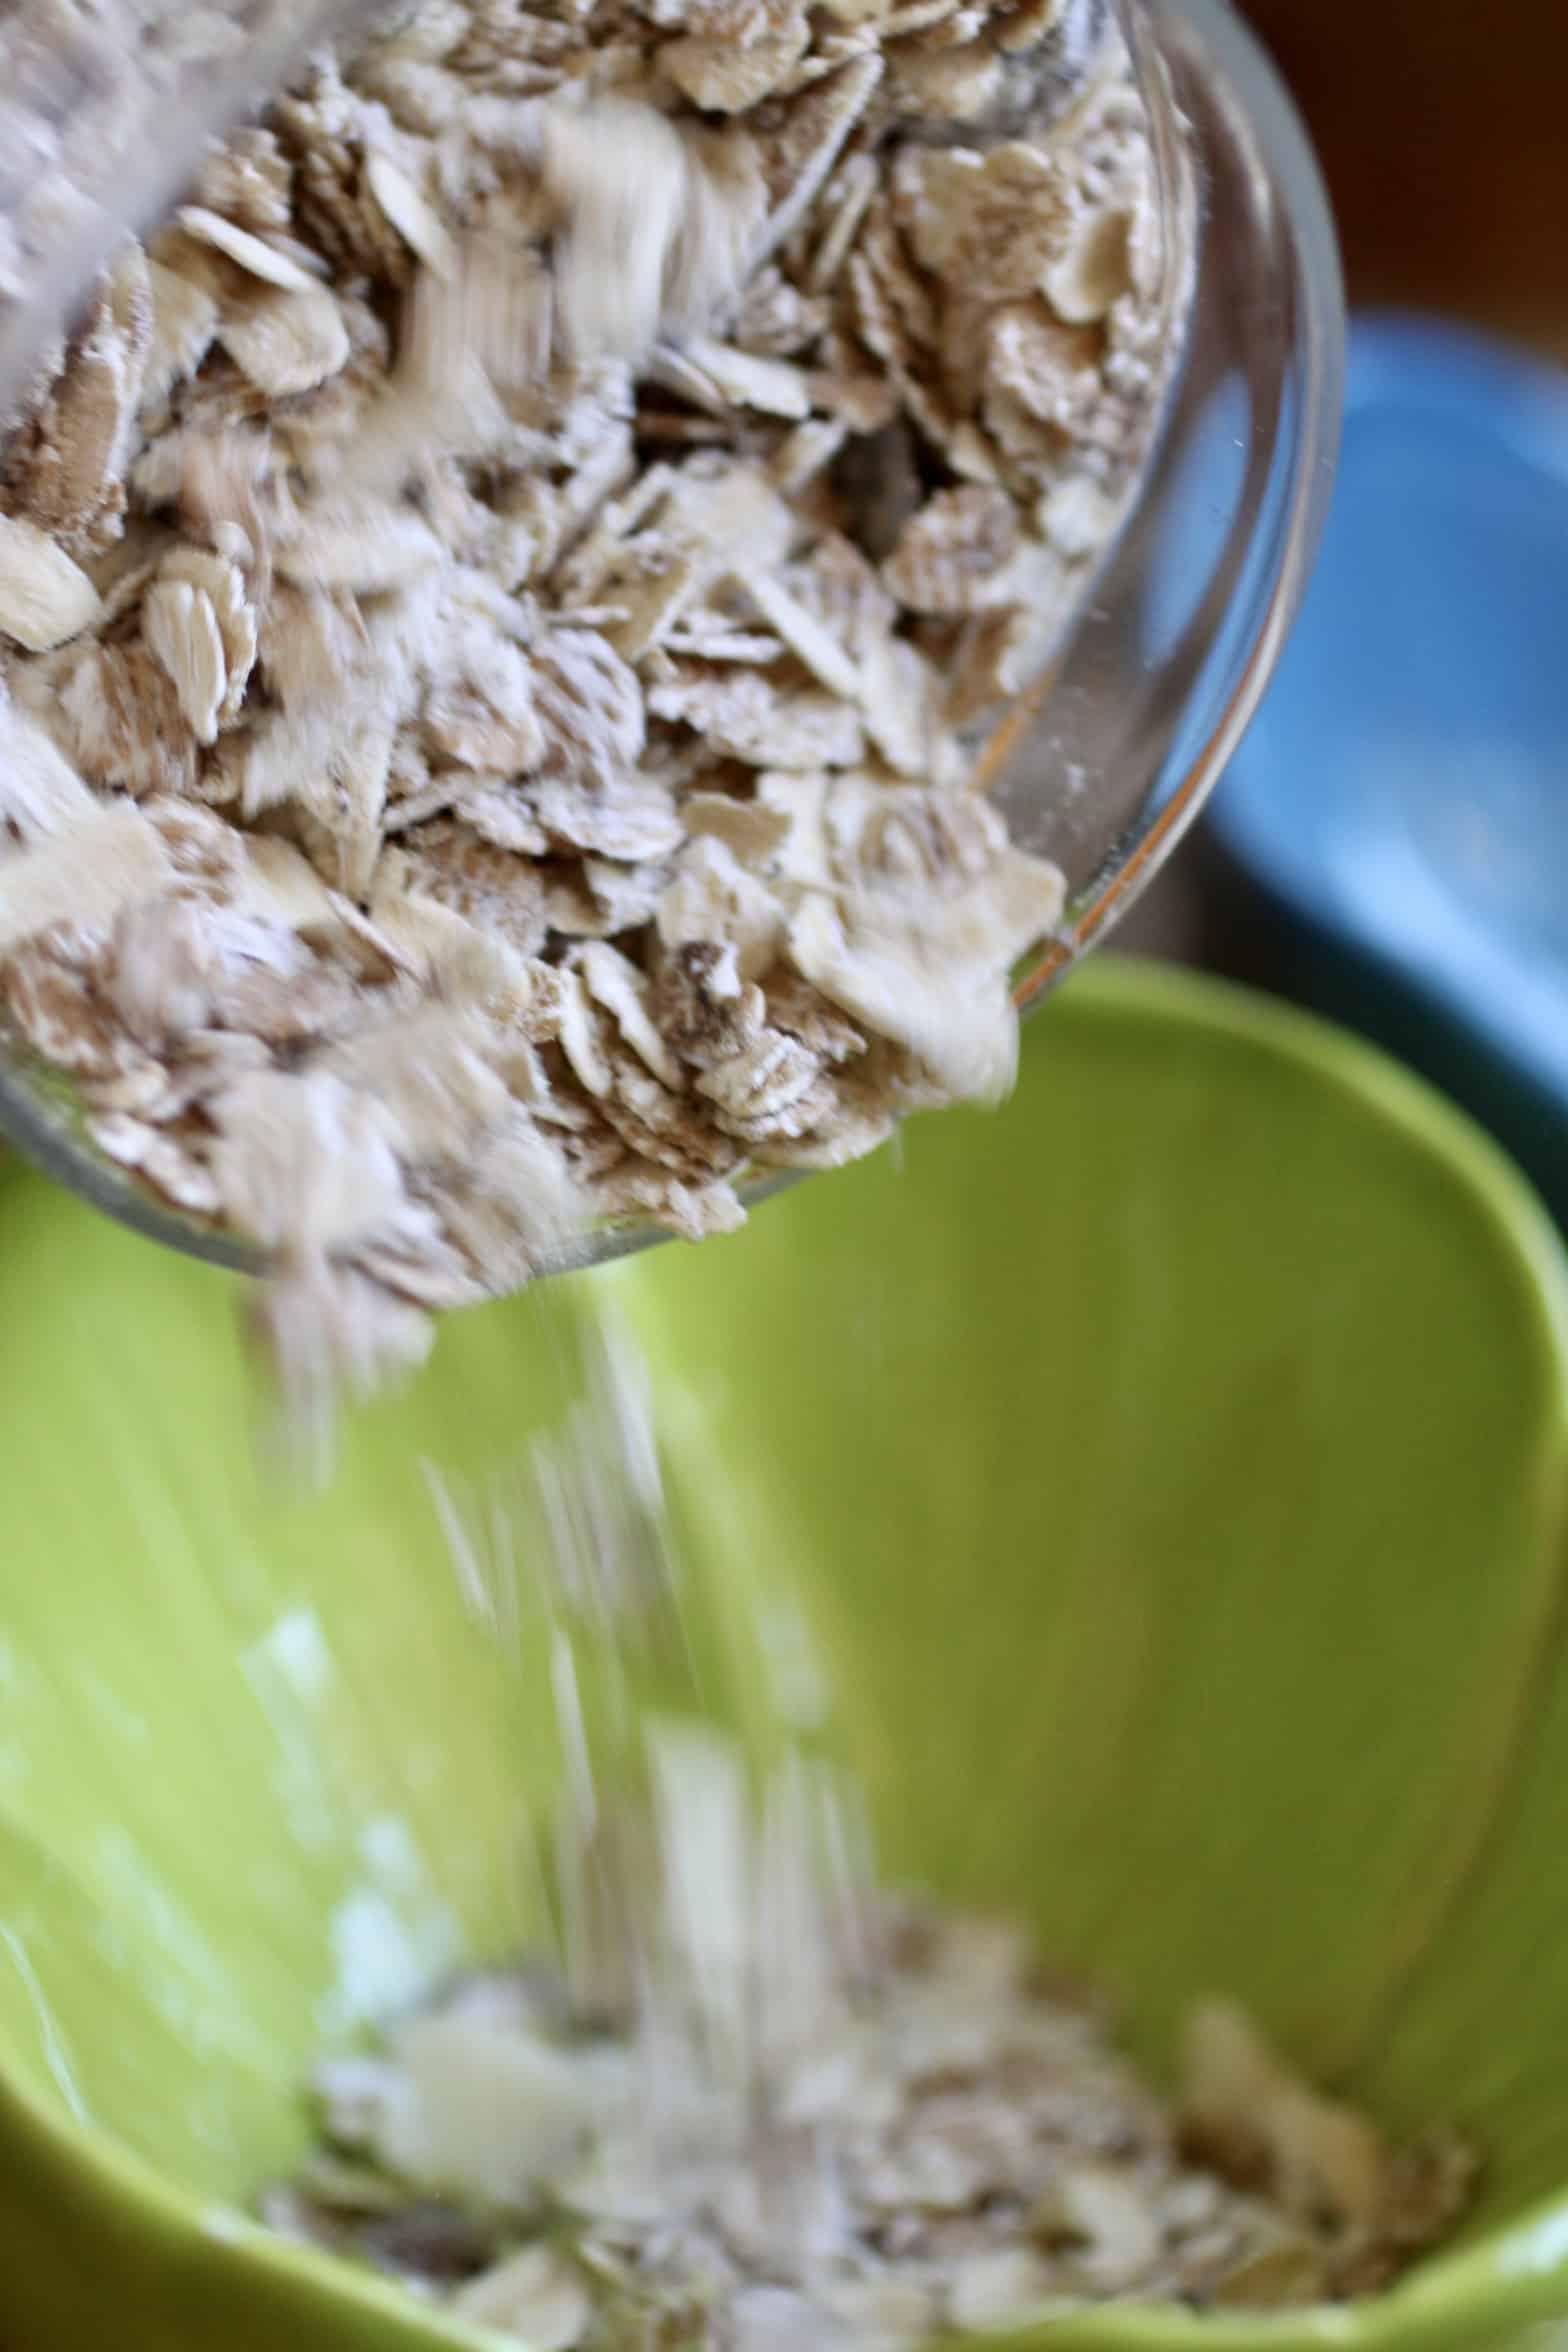 pouring muesli into a bowl